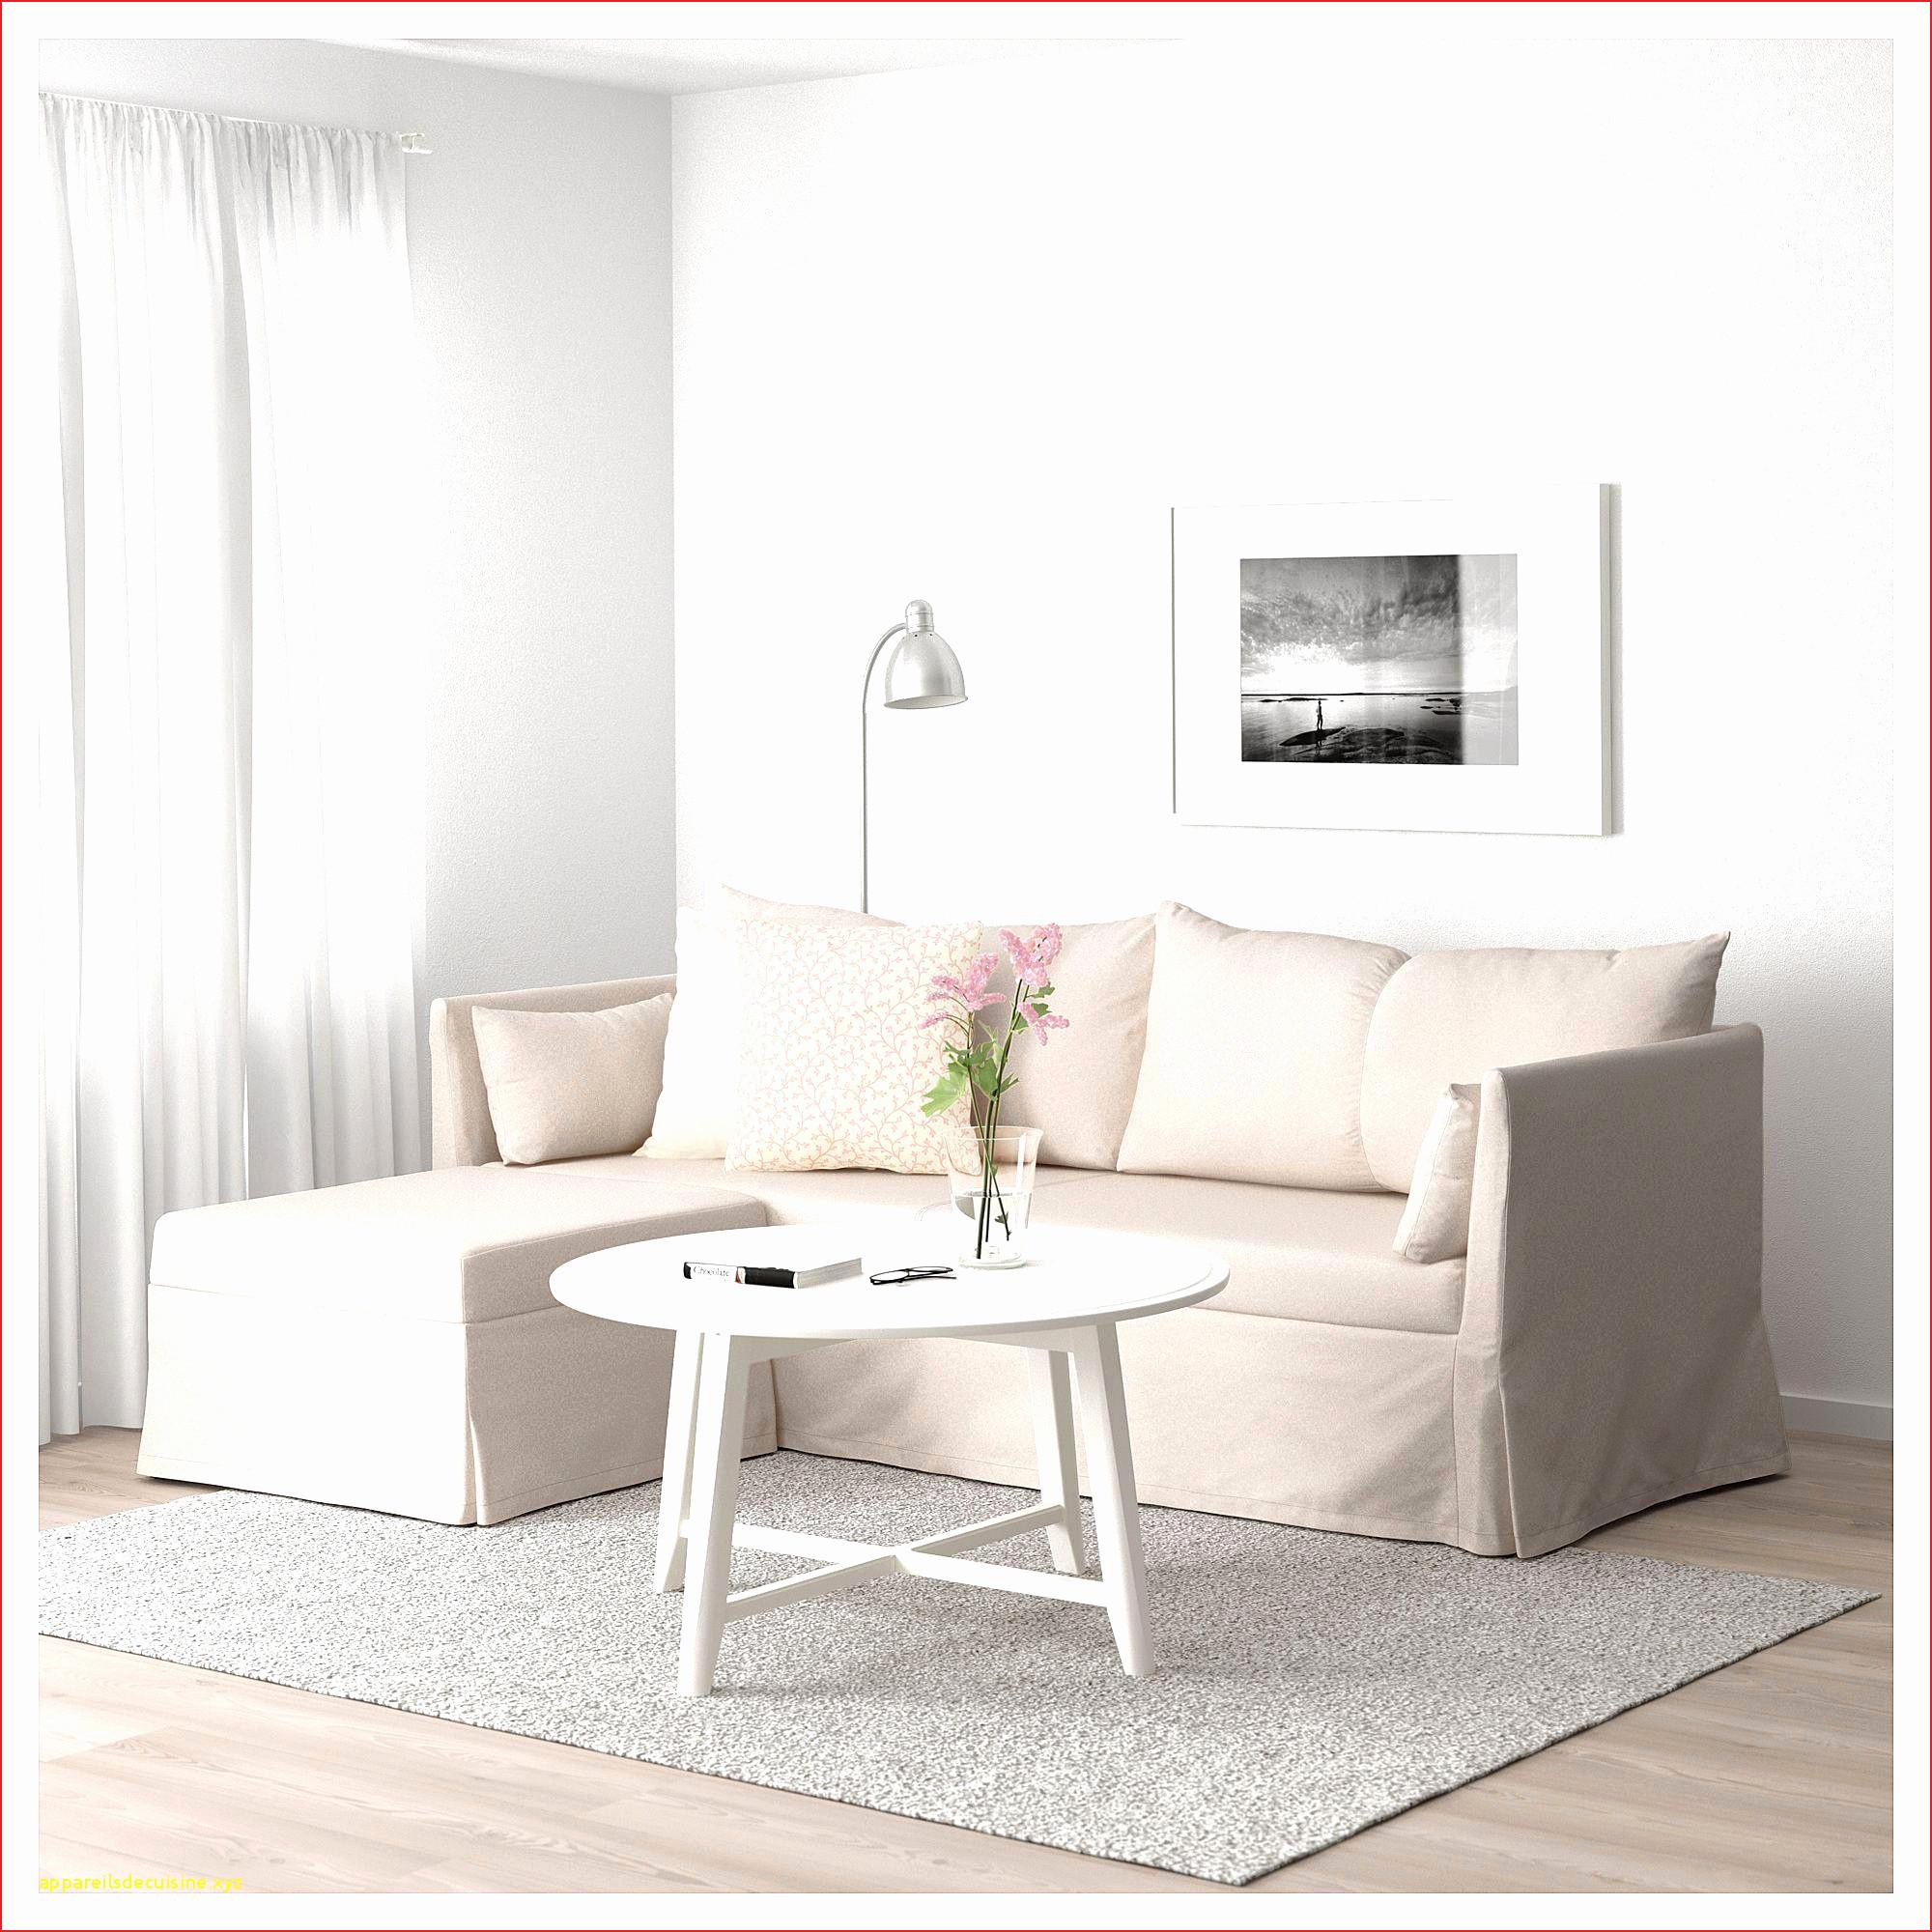 armoire blanche chambre meuble blanc chambre armoires en bois pour chambre luxury of armoire blanche chambre